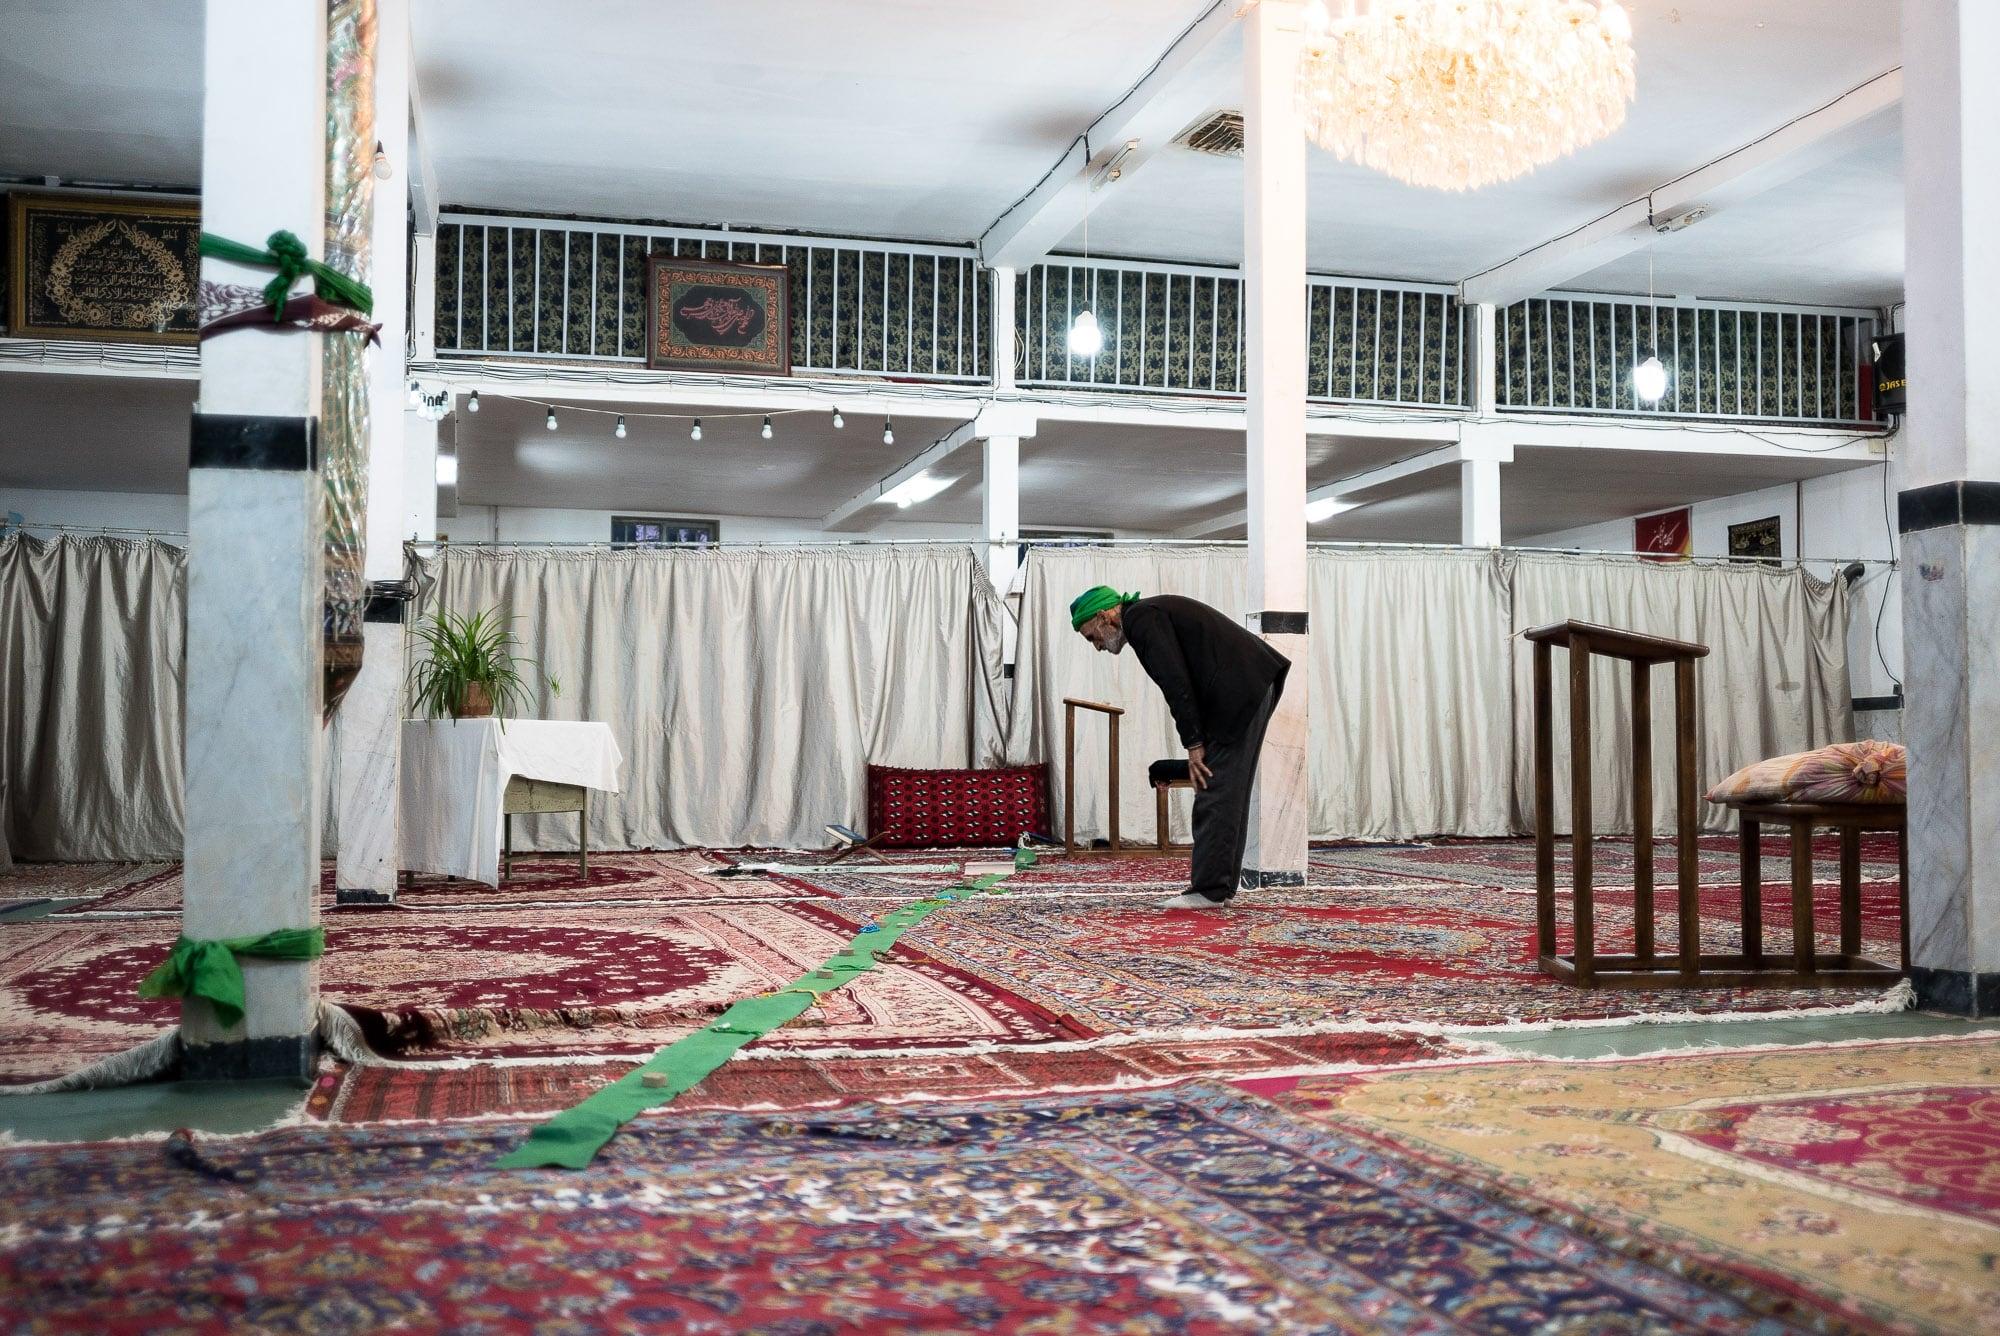 Now Bahar mosque